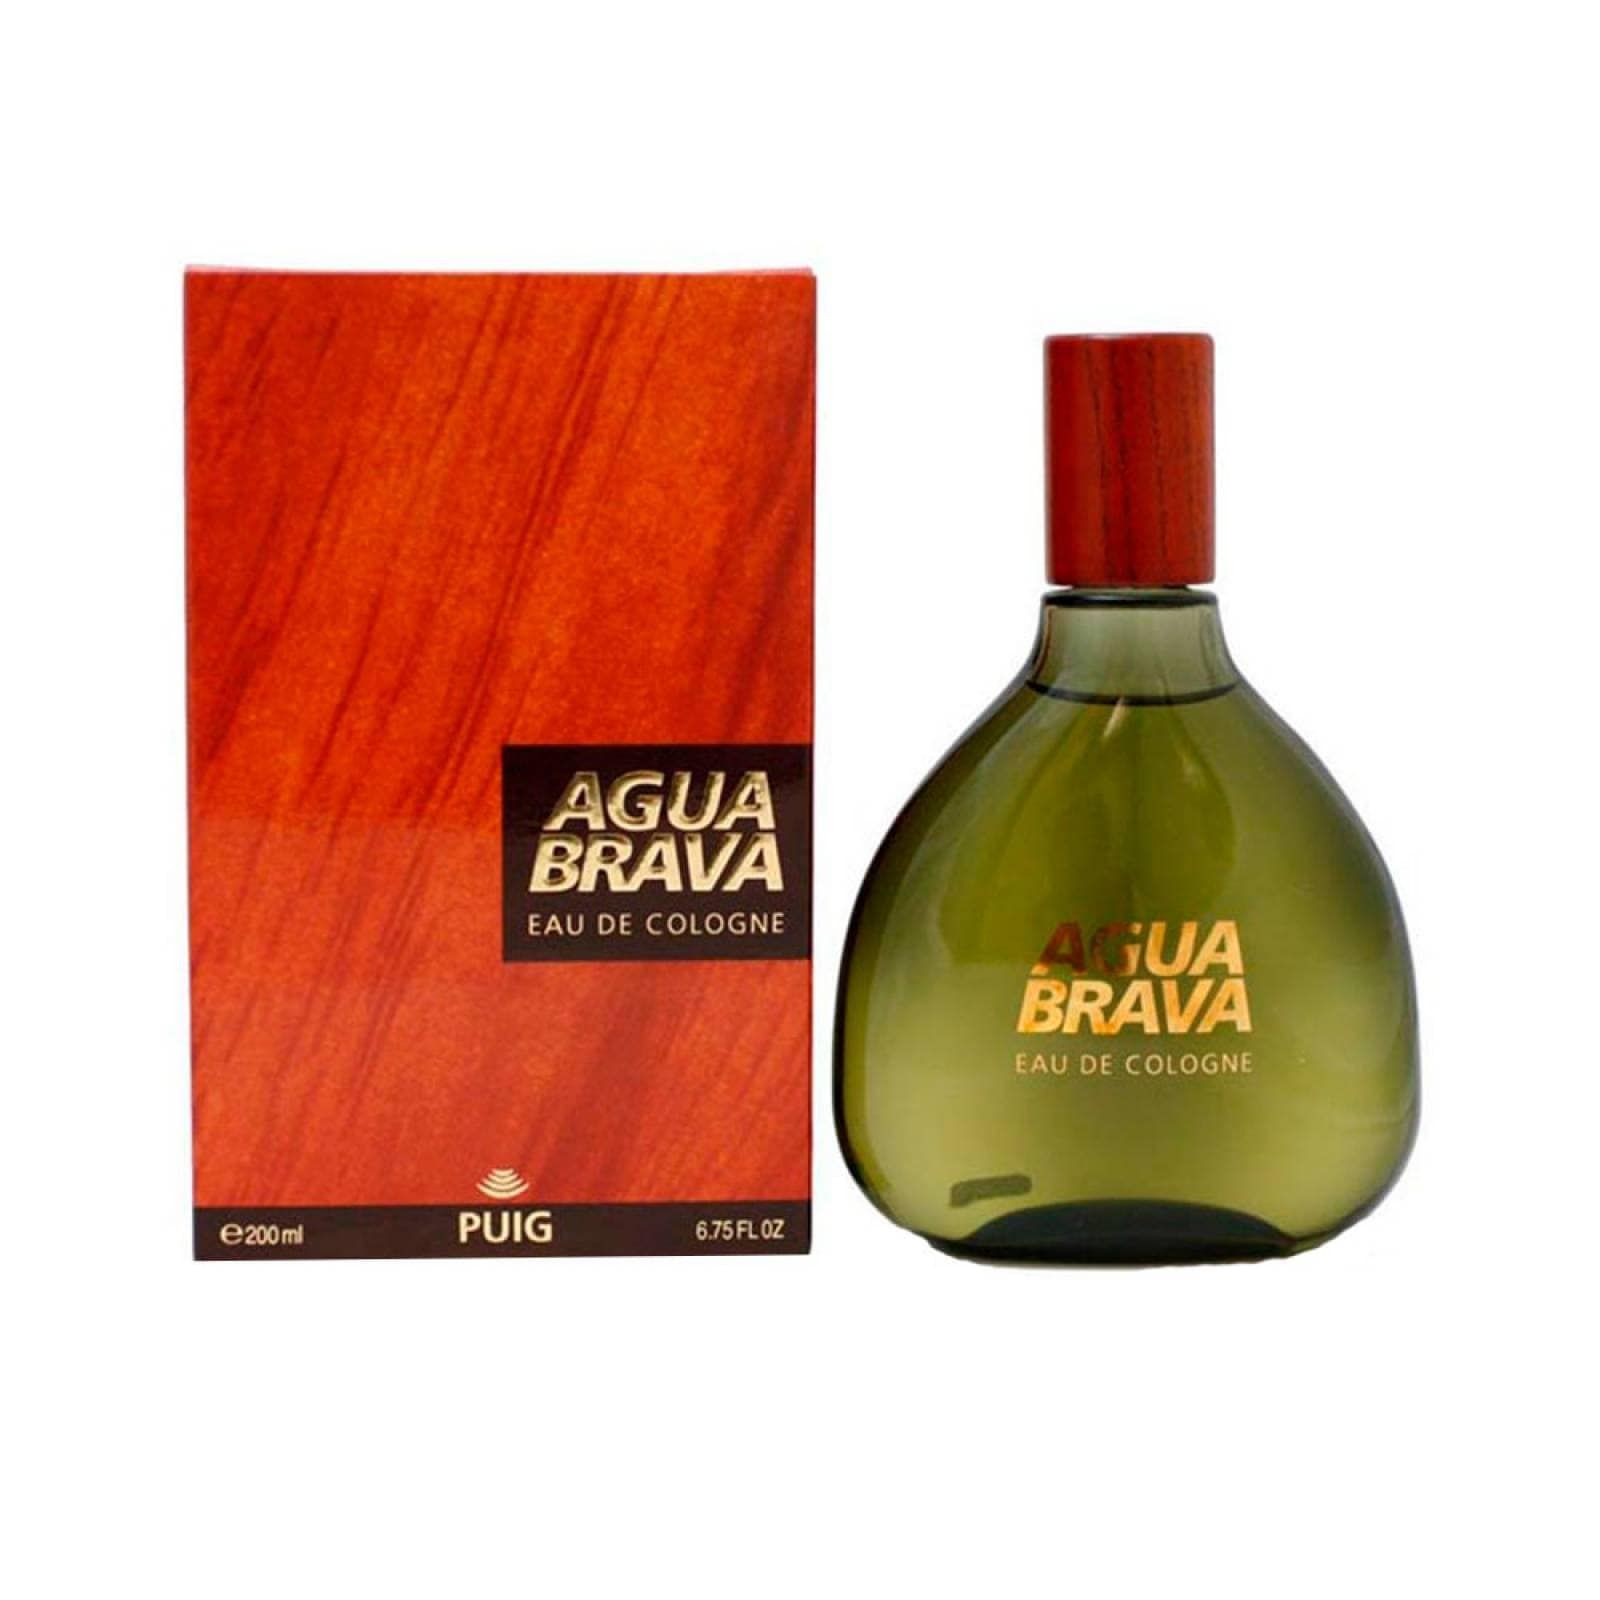 Agua Brava de Antonio Puig Eau De Cologne 200 ml